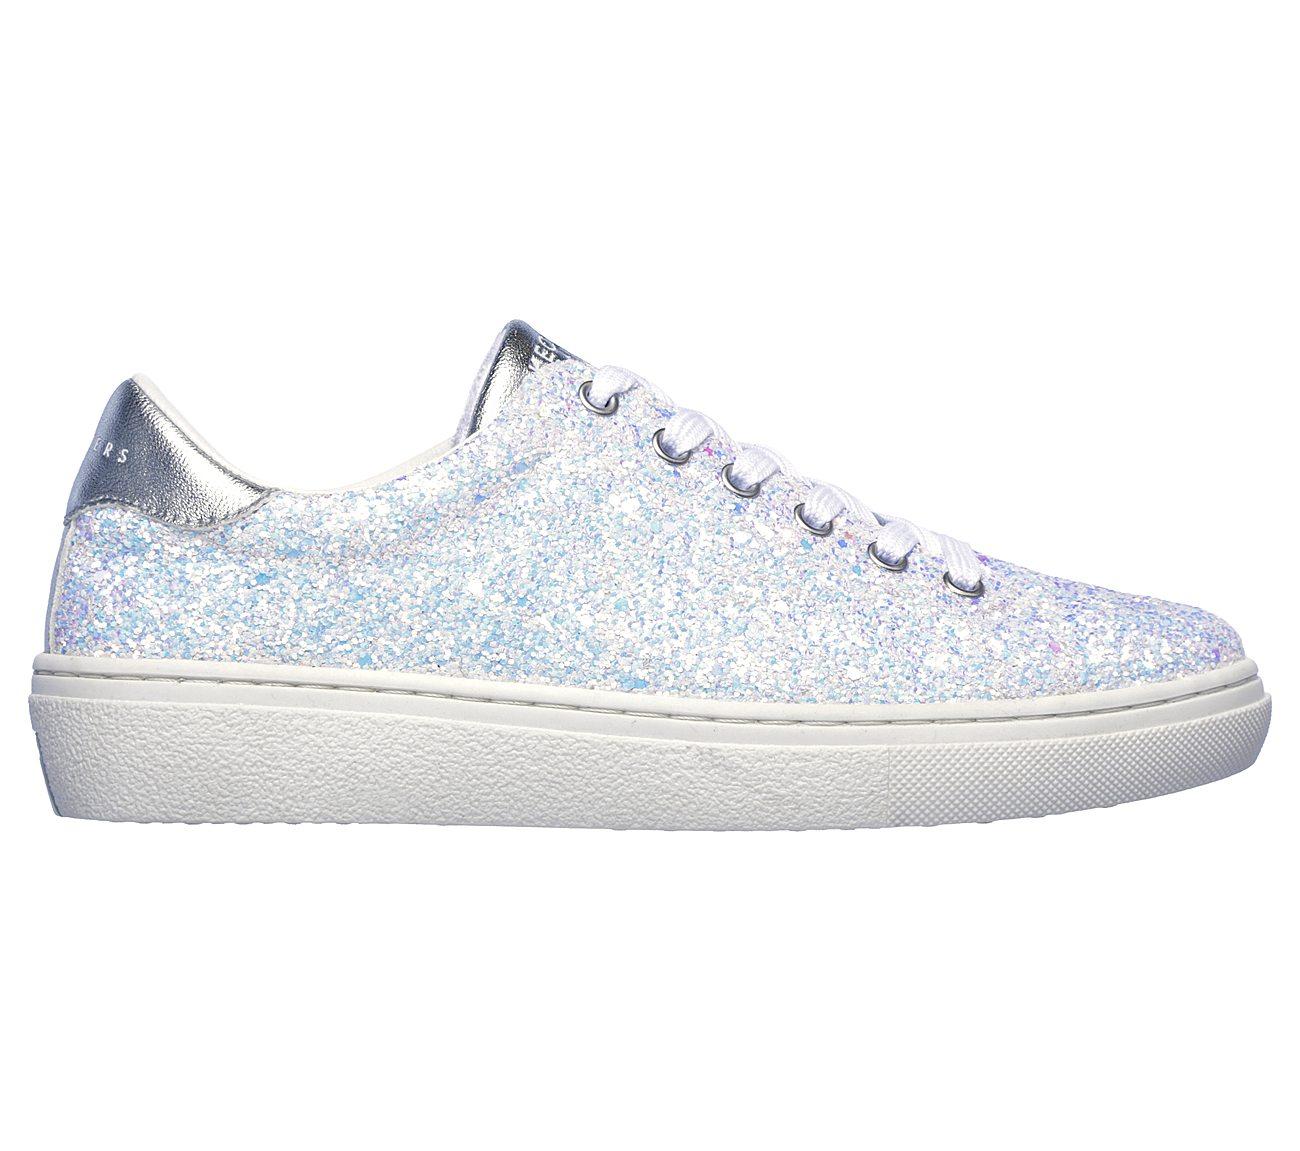 Buy SKECHERS Goldie - Diamond Mist